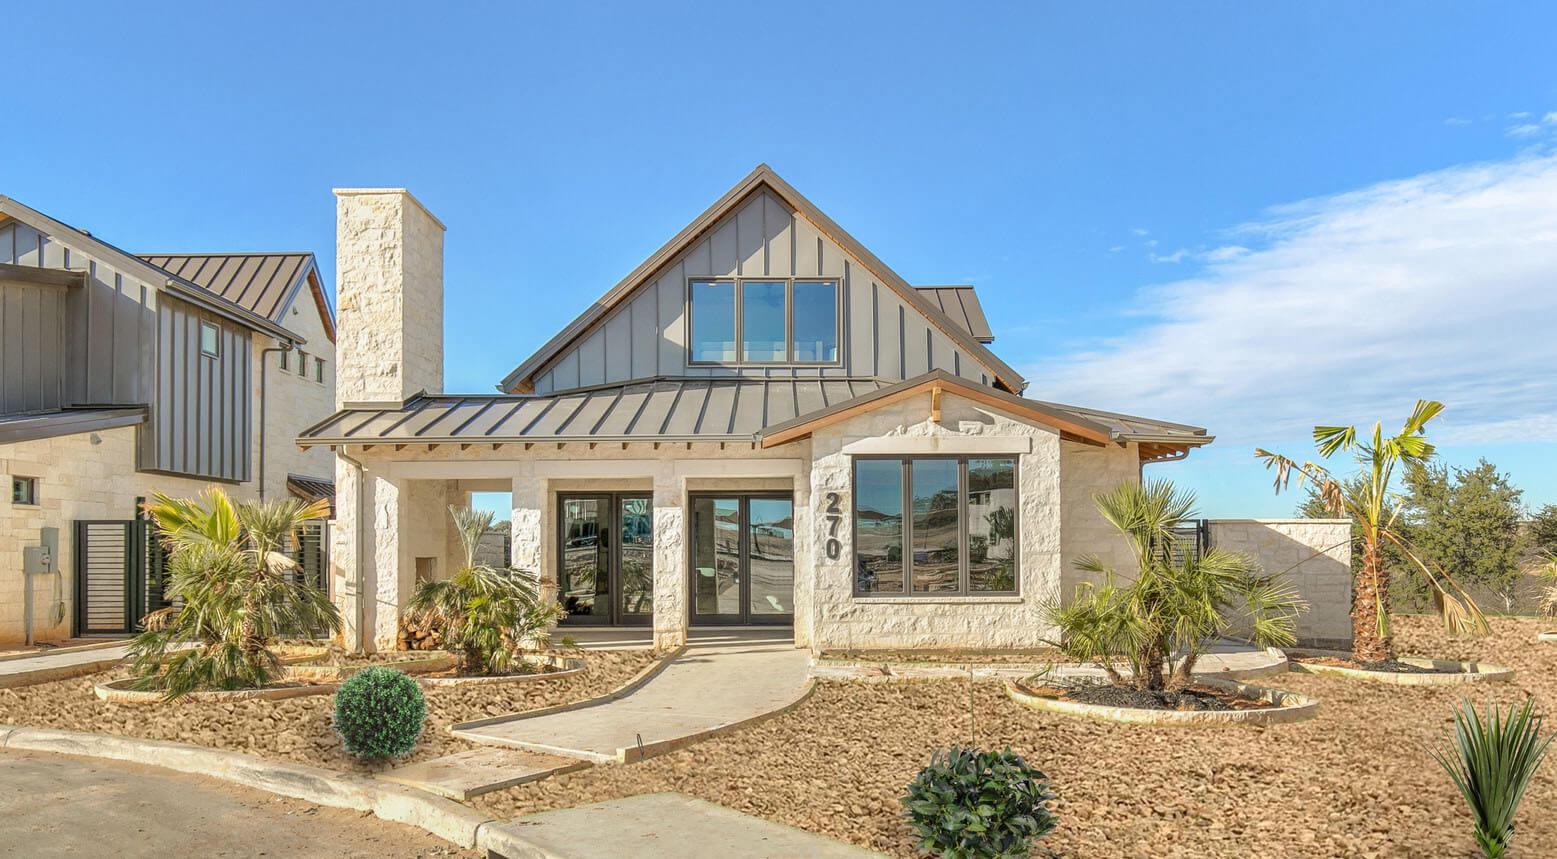 Steve-Bumpas-Custom-Homes-The-Residences-at-Rough-Creek-Lodge-The-Lynn-Lot-15-01.jpg